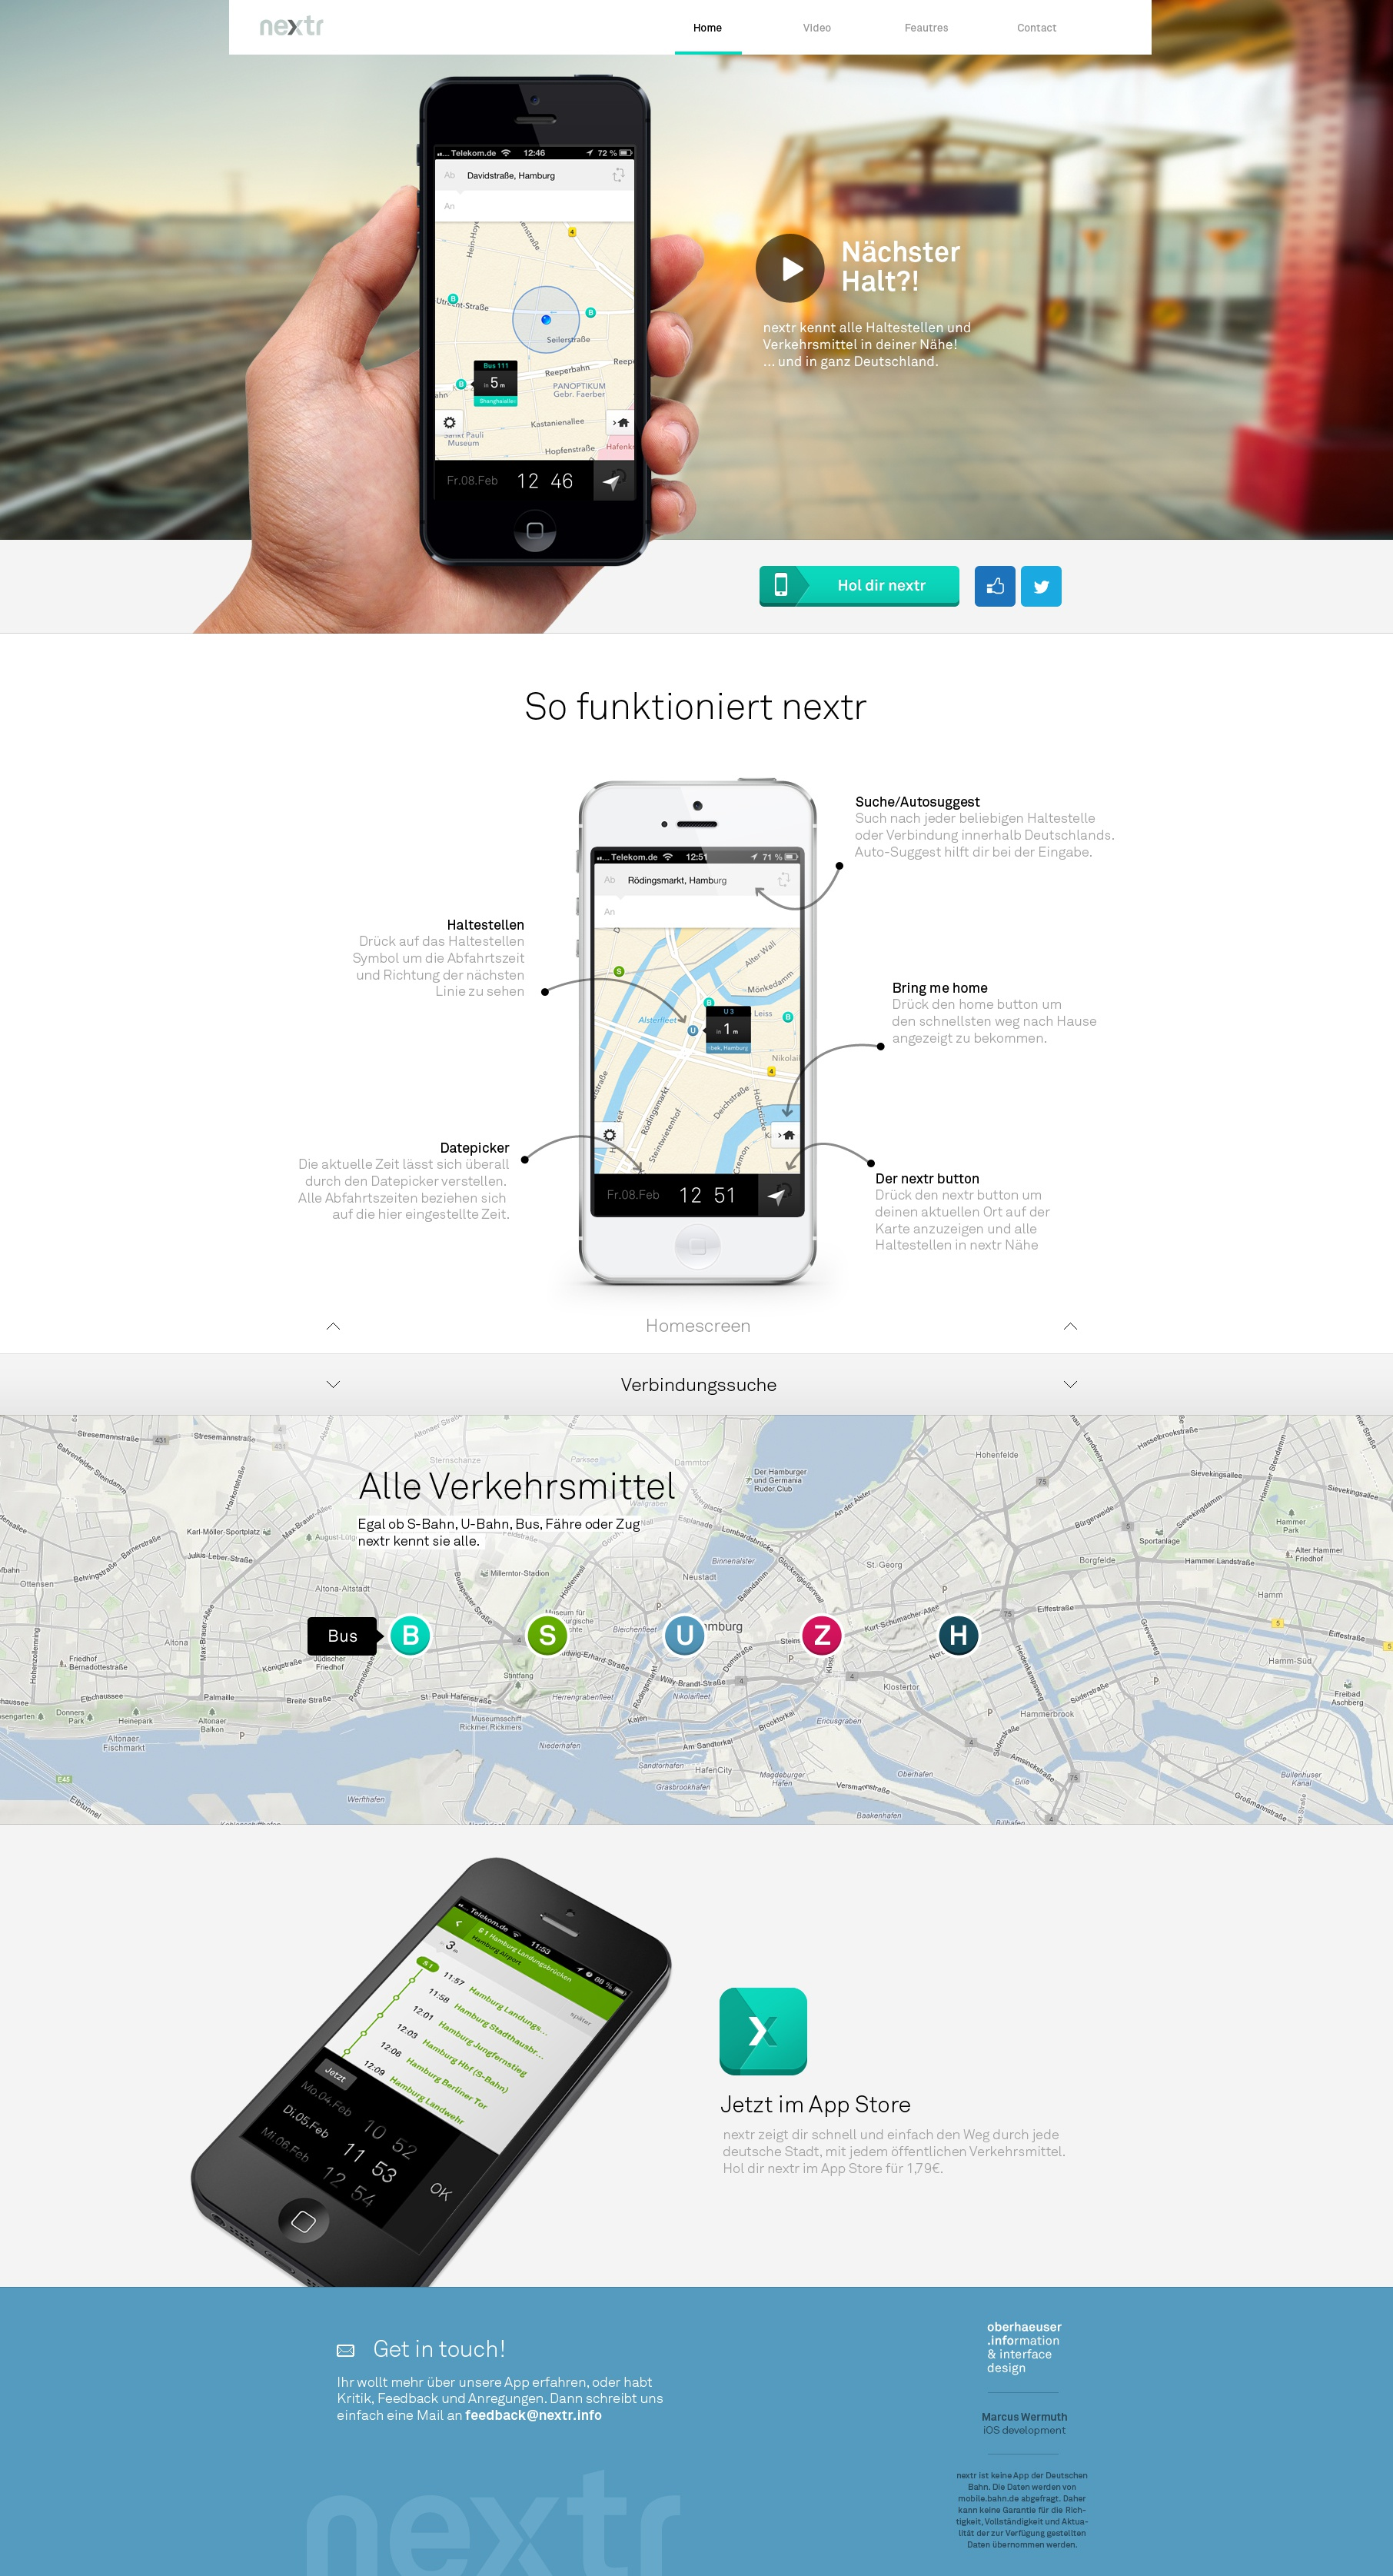 Nextr homepage realpixel